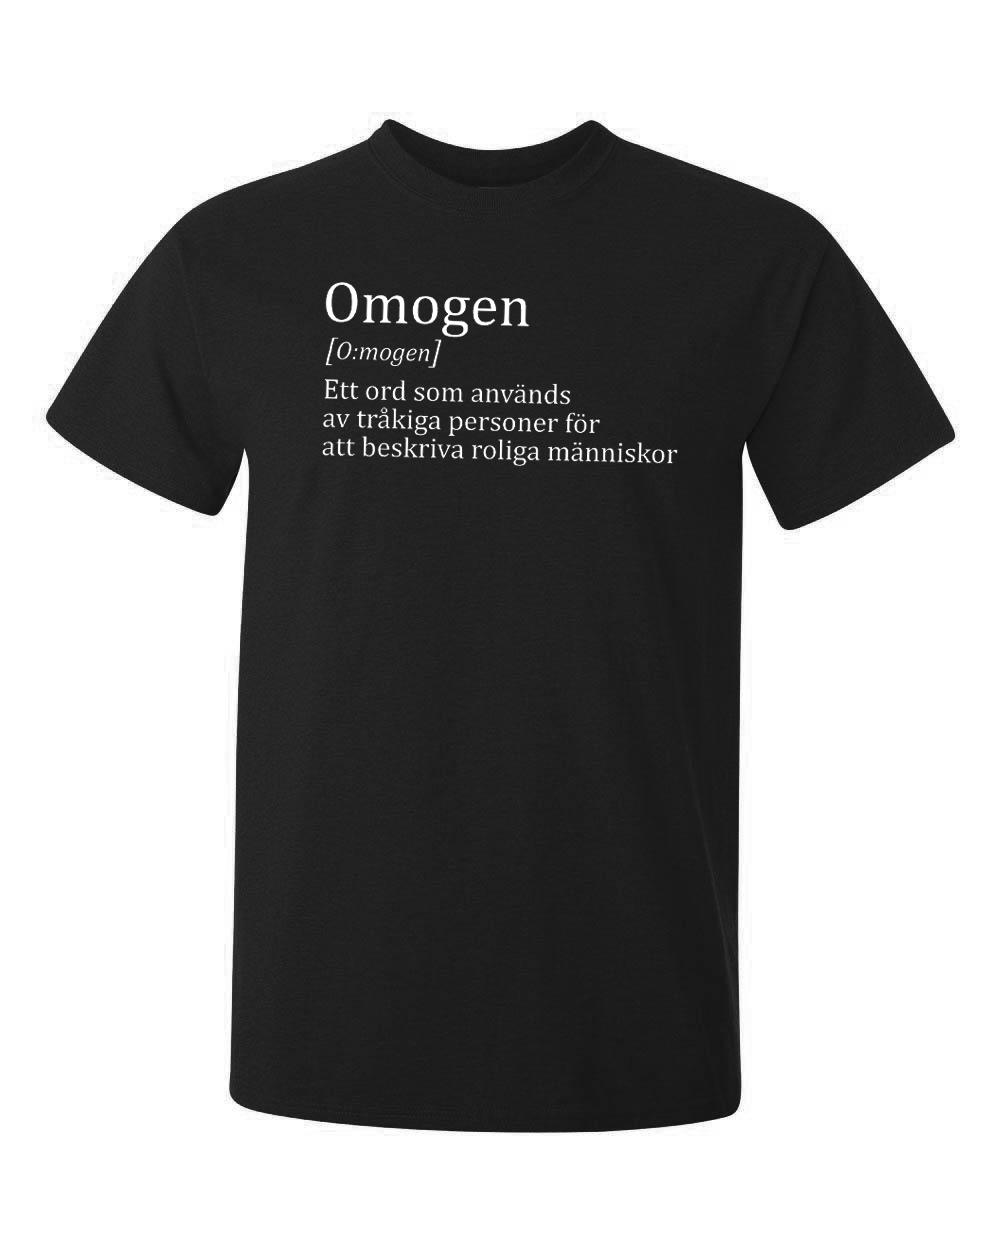 Omogen T-shirt